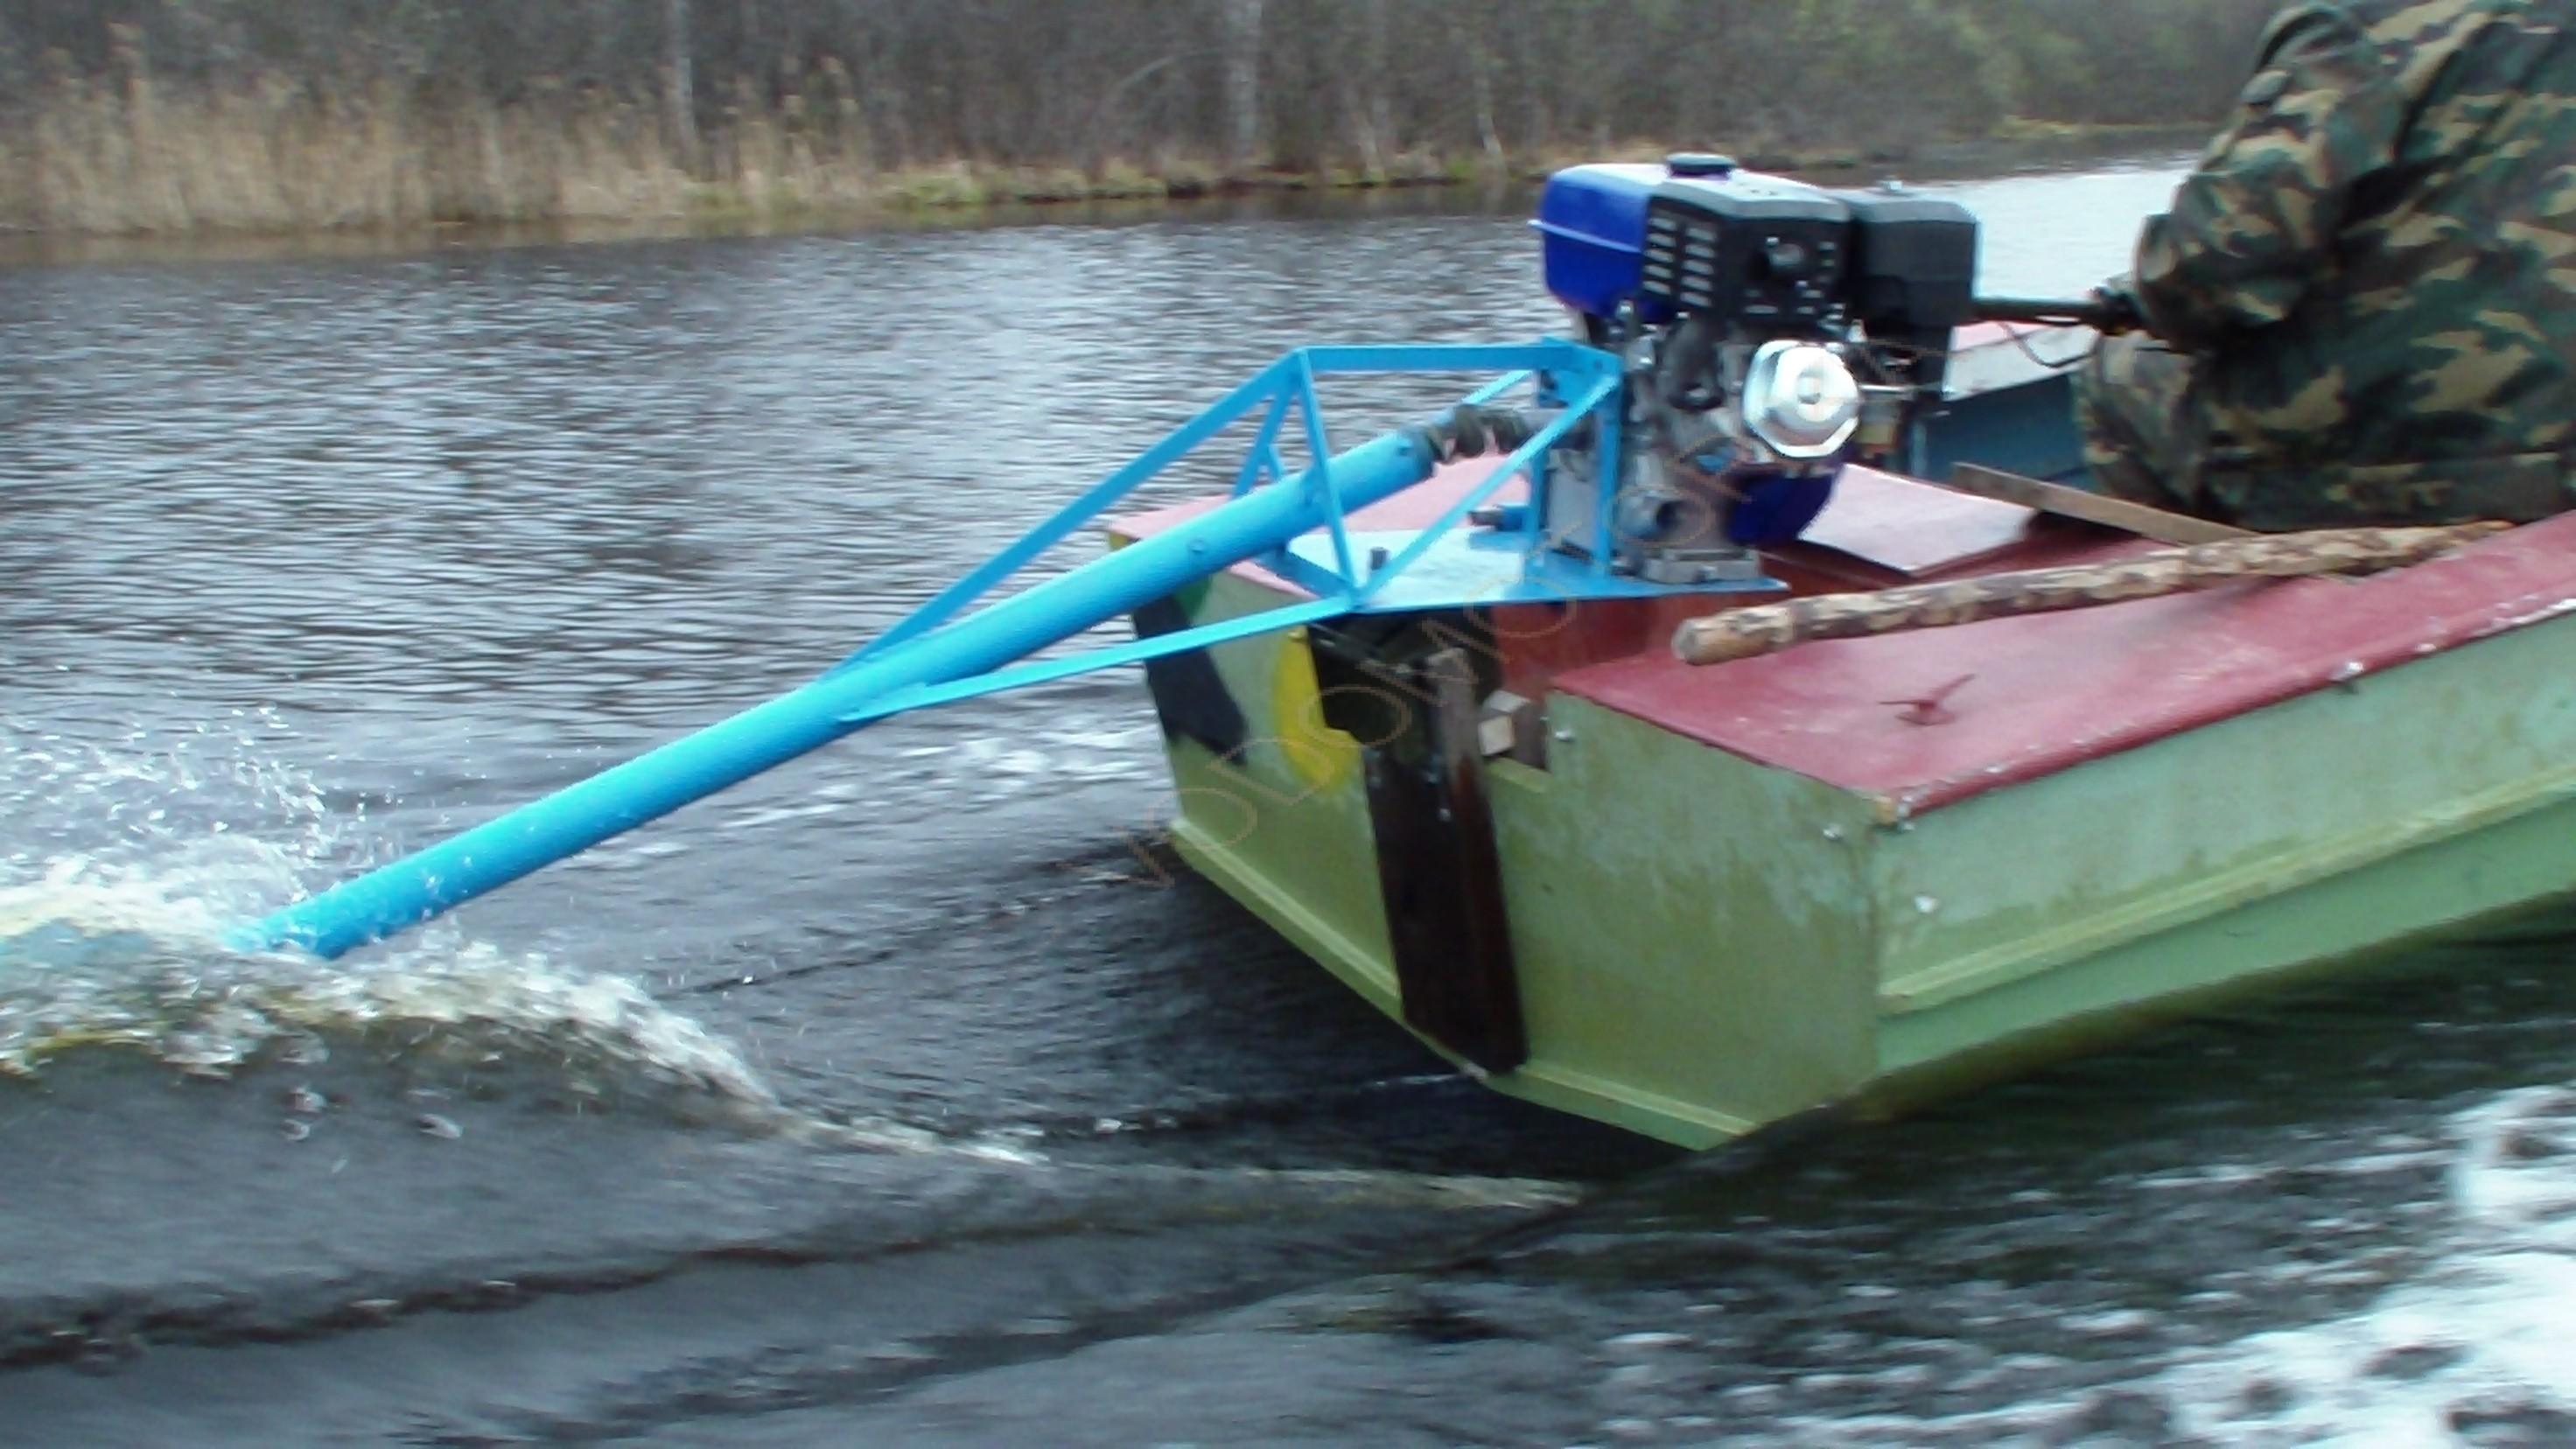 видео лодка болотоход